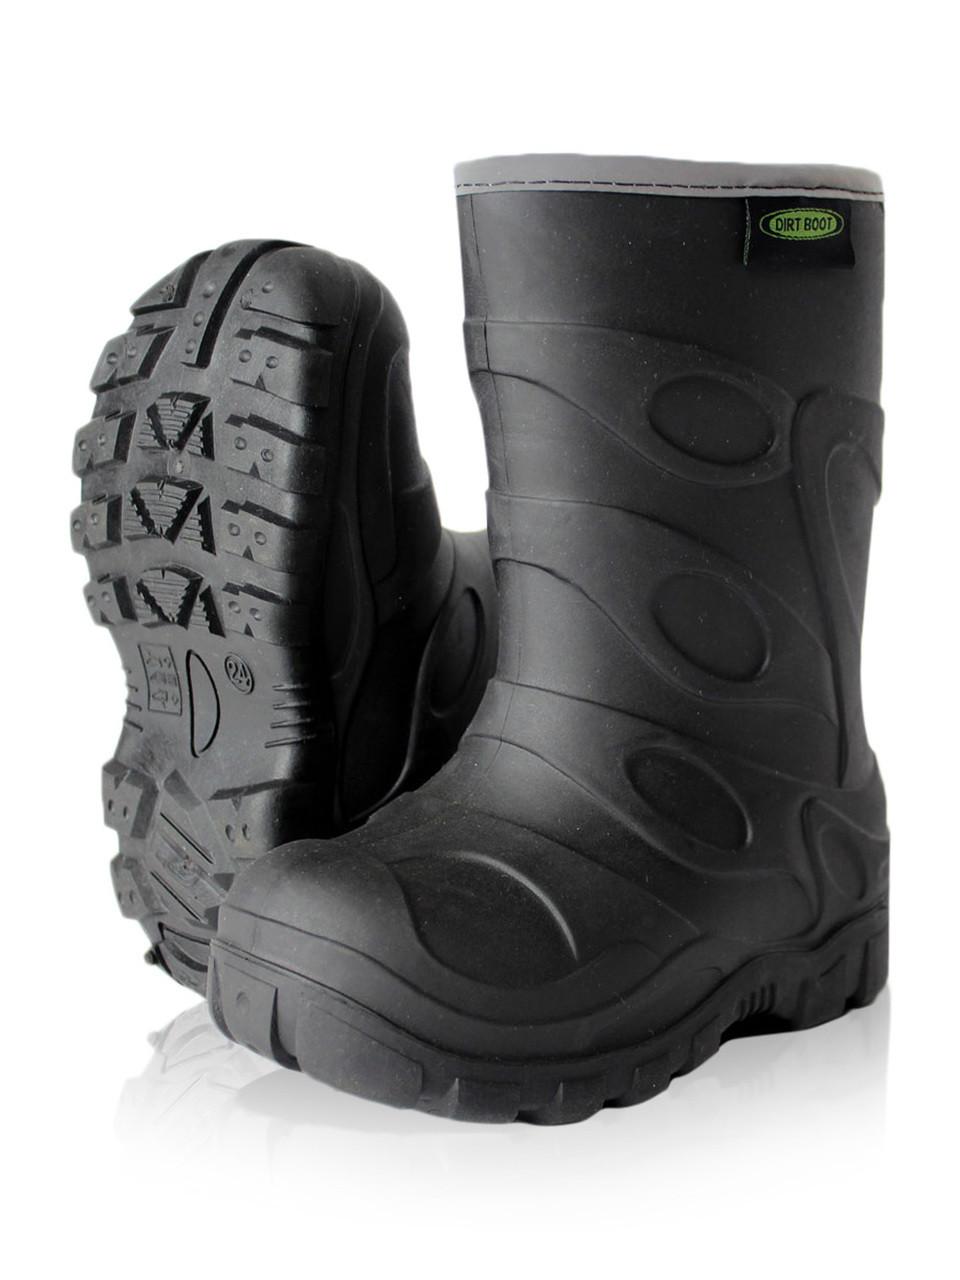 Dirt Boot® Boys Girls Thermal Winter Wellington Muck Field Wellies Kids  Rain Snow Bootie TPR